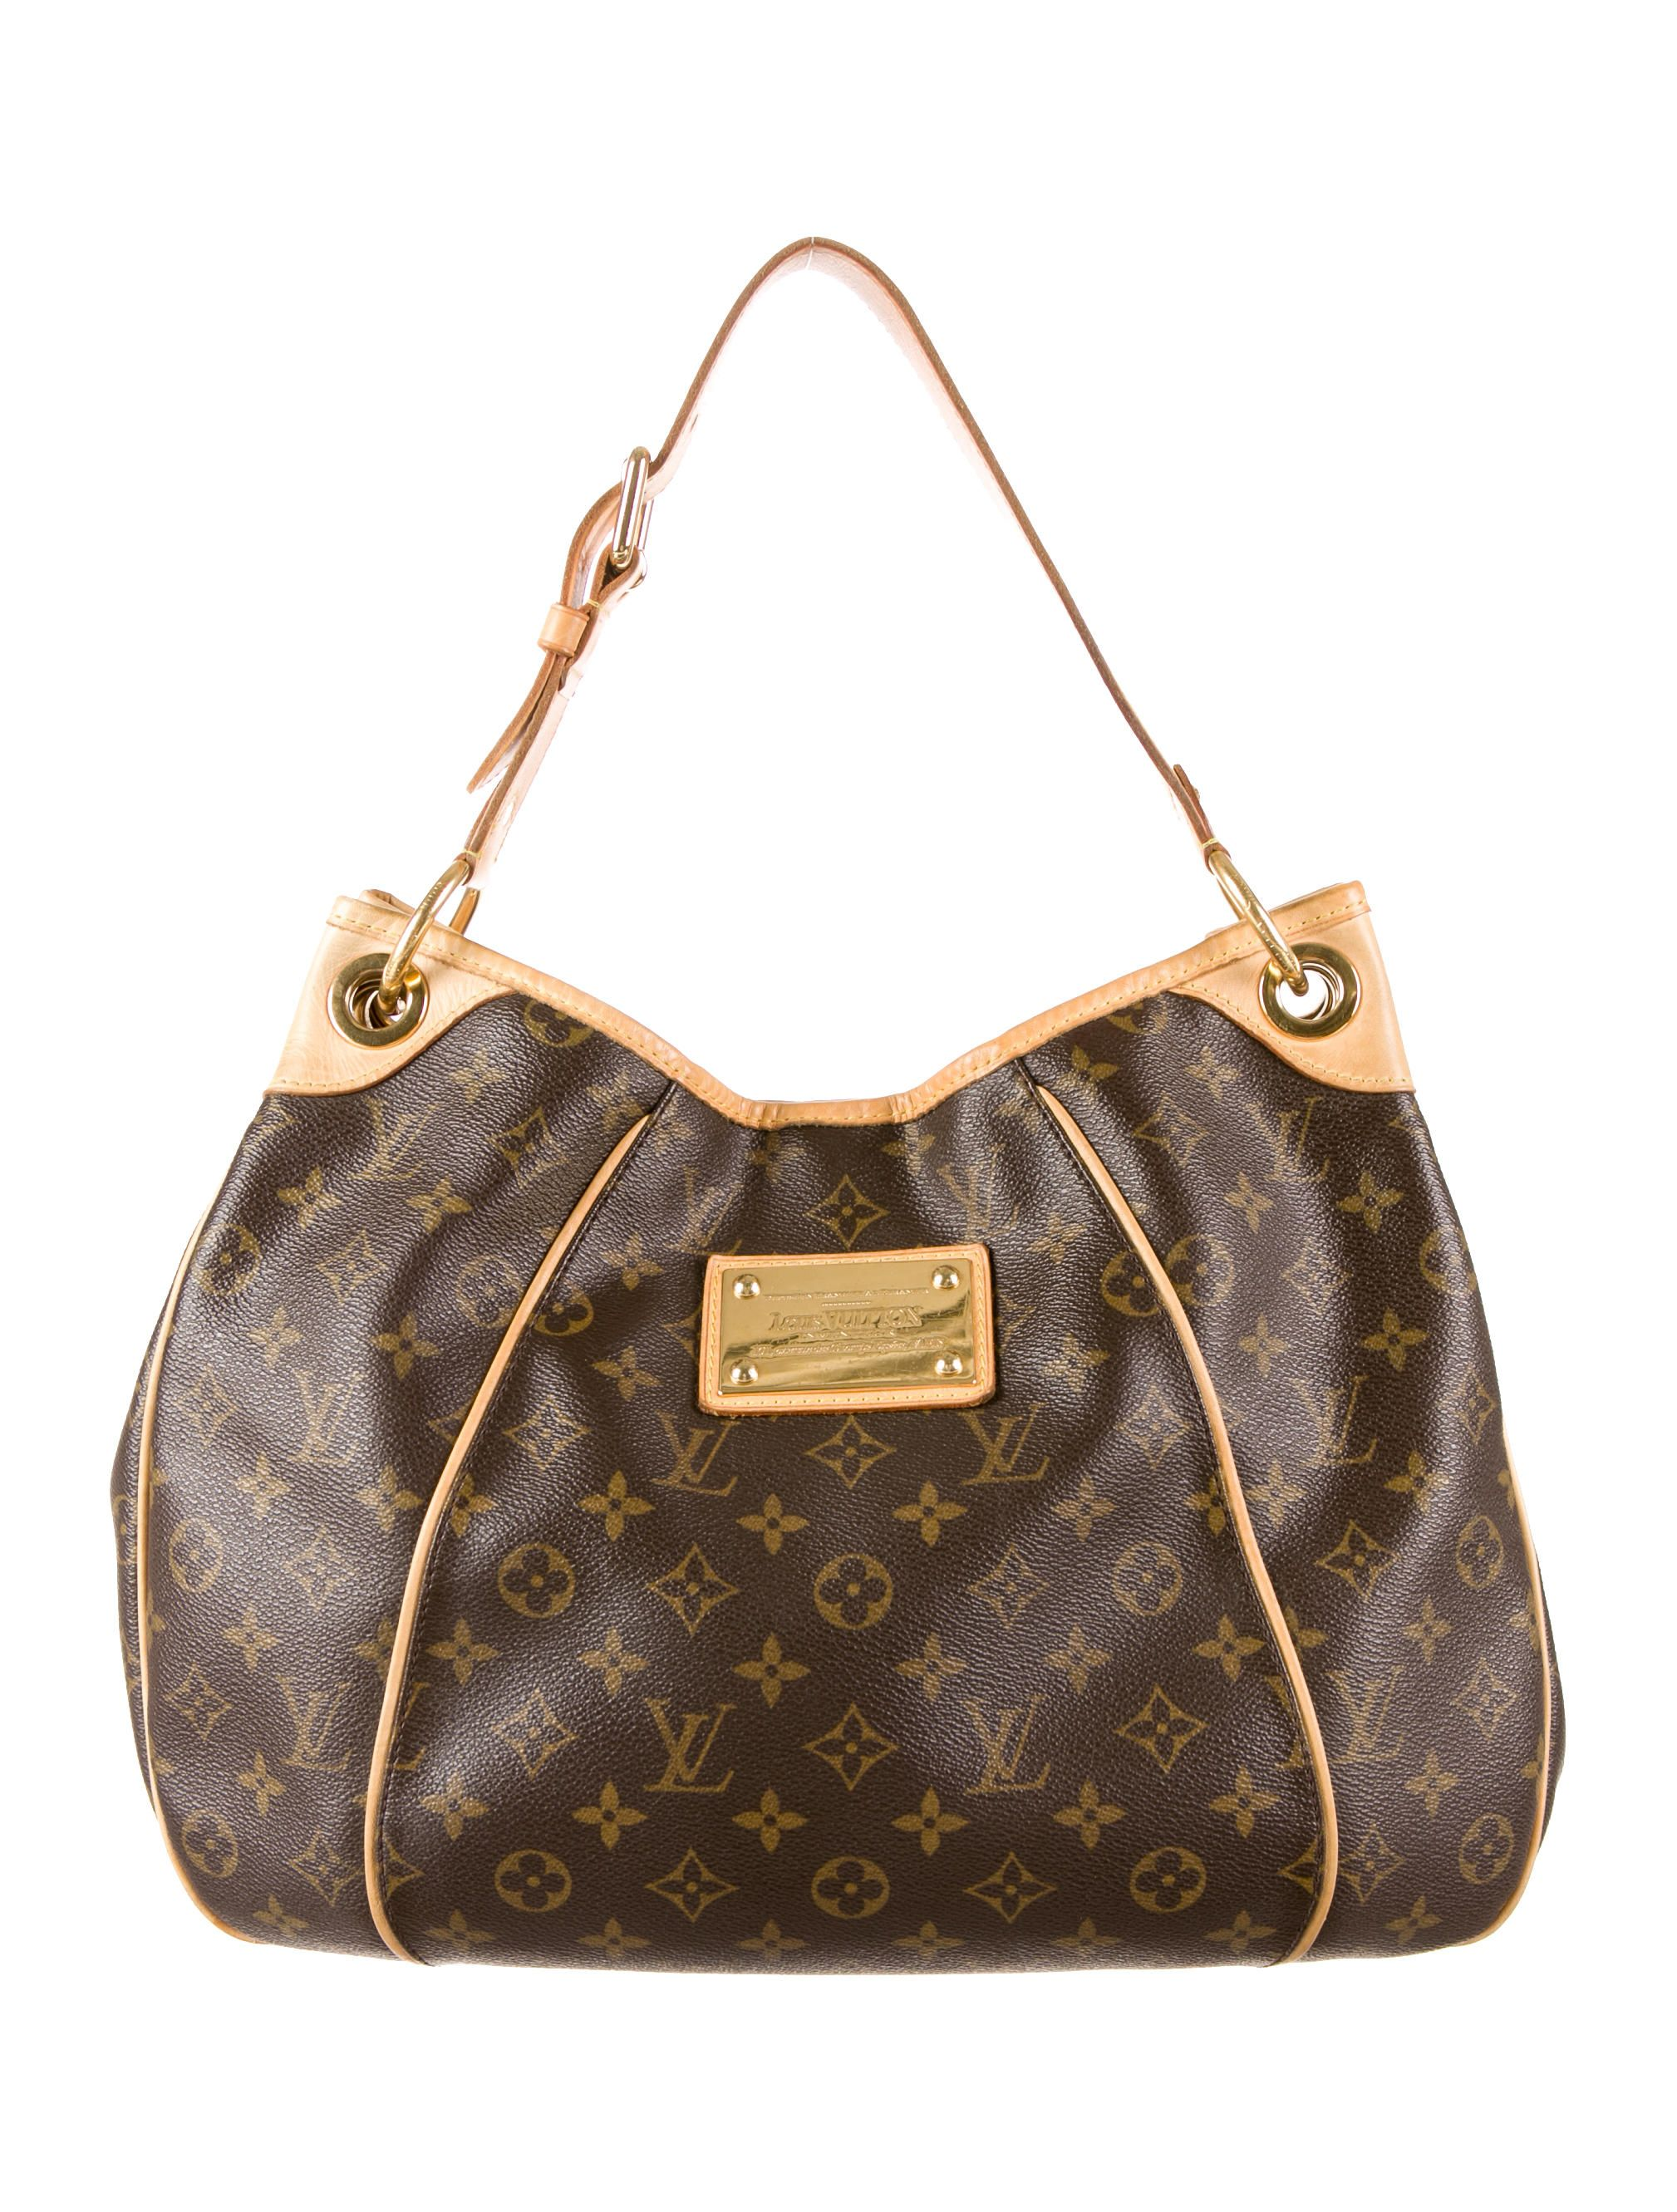 4d46e8ab586 Galliera PM | handbag | Louis vuitton monogram, Louis vuitton, Louis ...